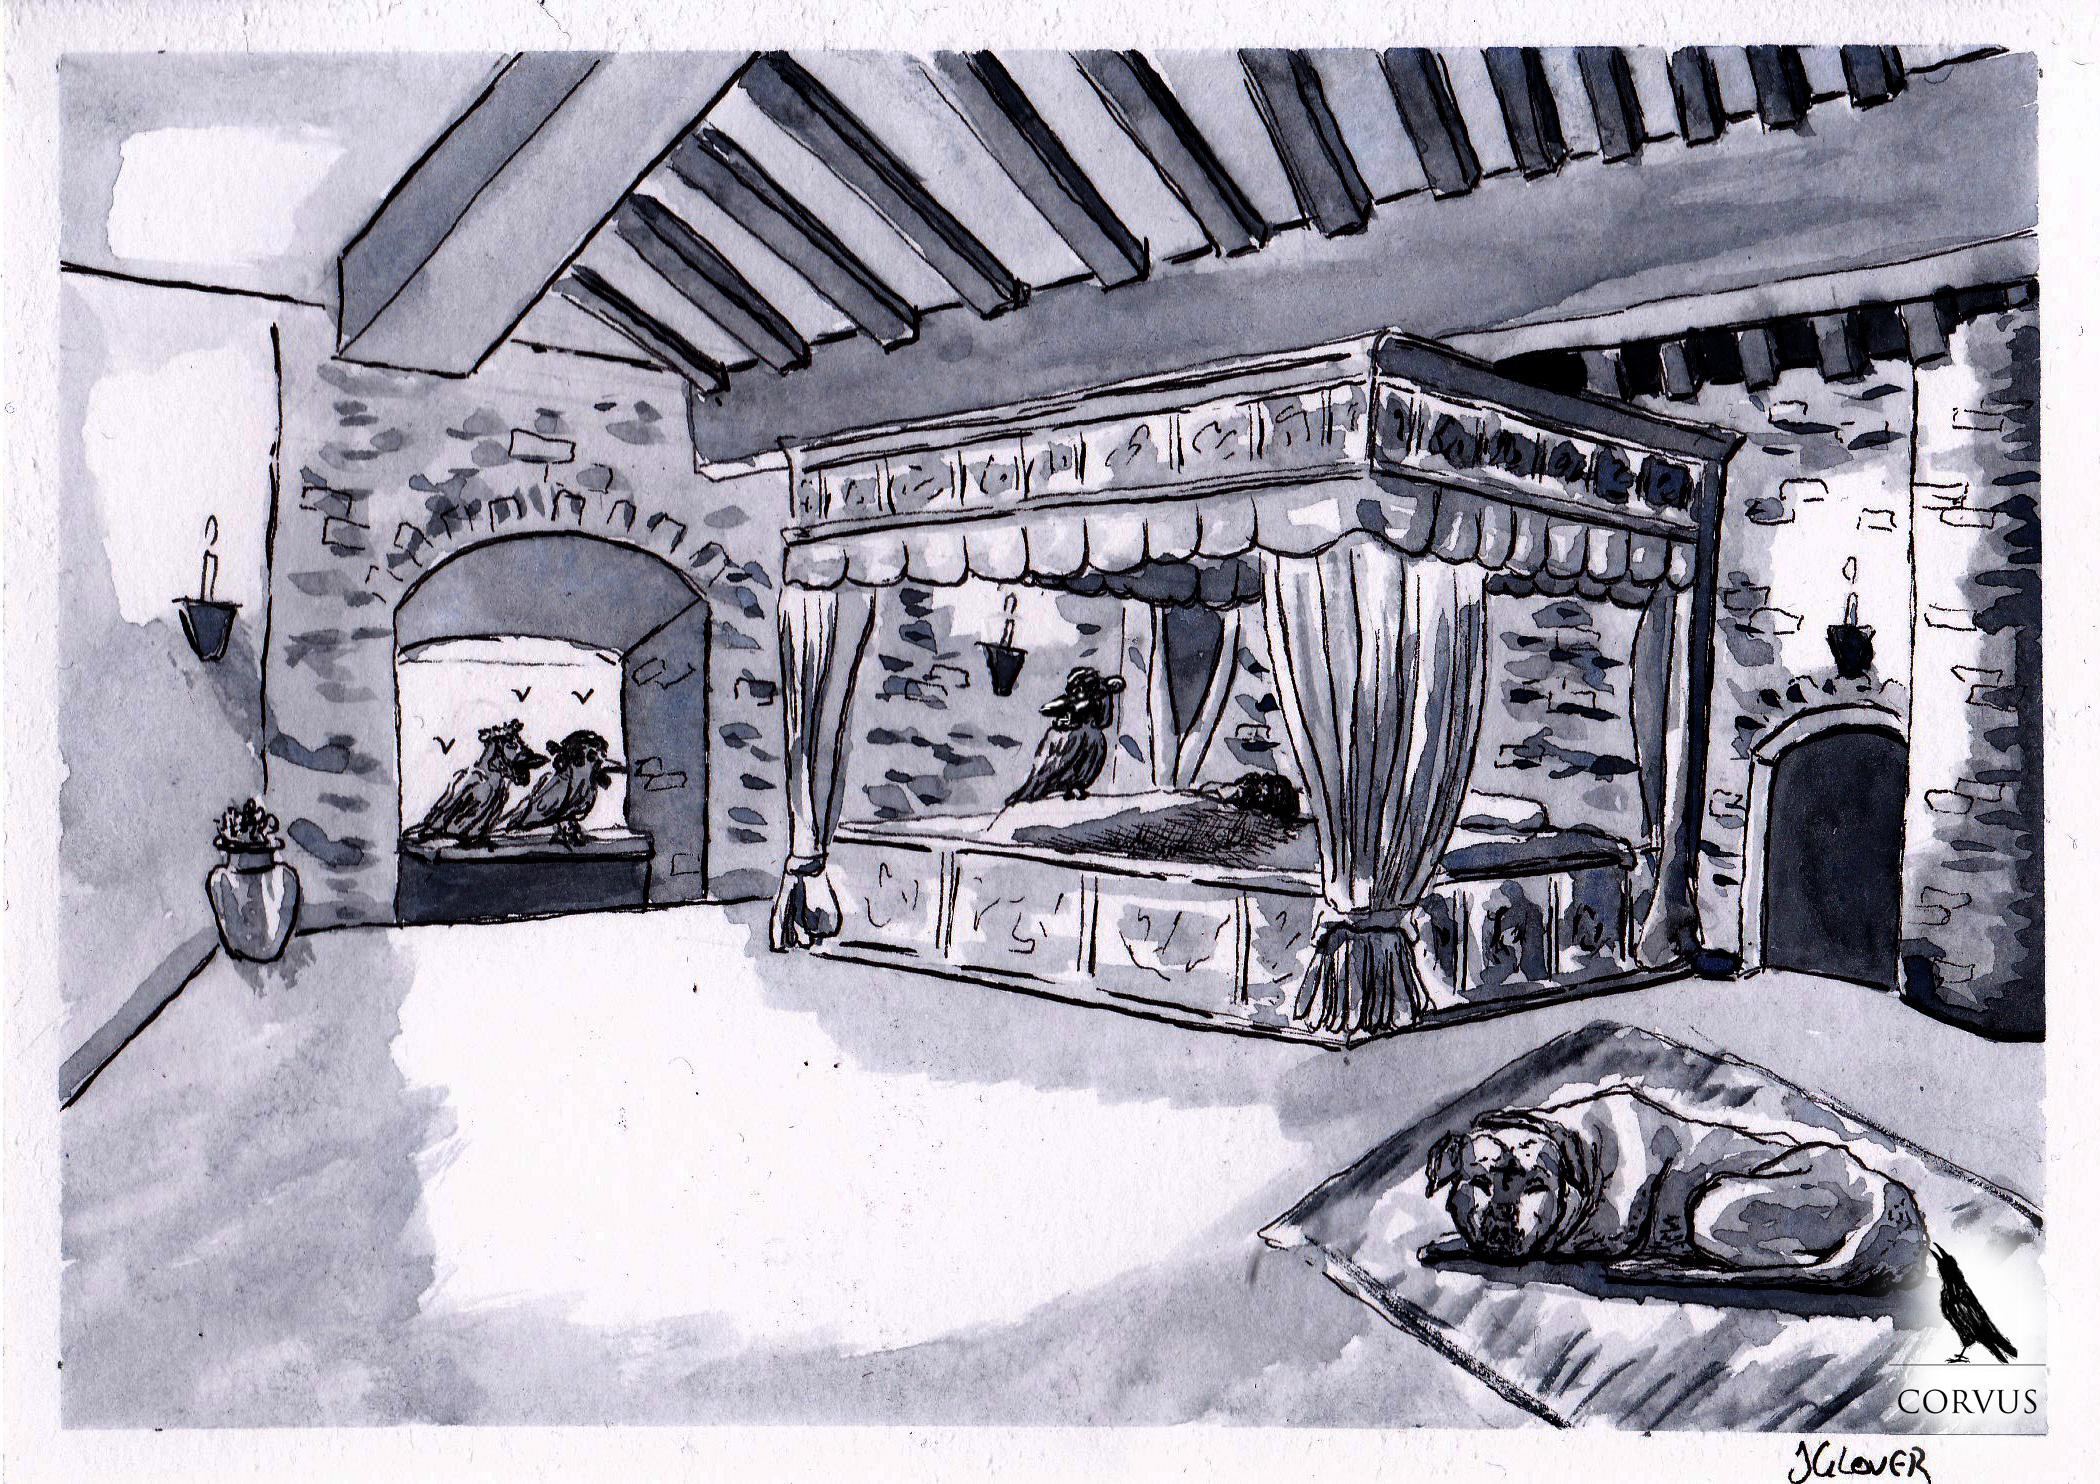 Corvus - Graphic Novel - Web Comic - Art -Illustration - Drawing - Ink - Ravens - Corvids - Folk Lore